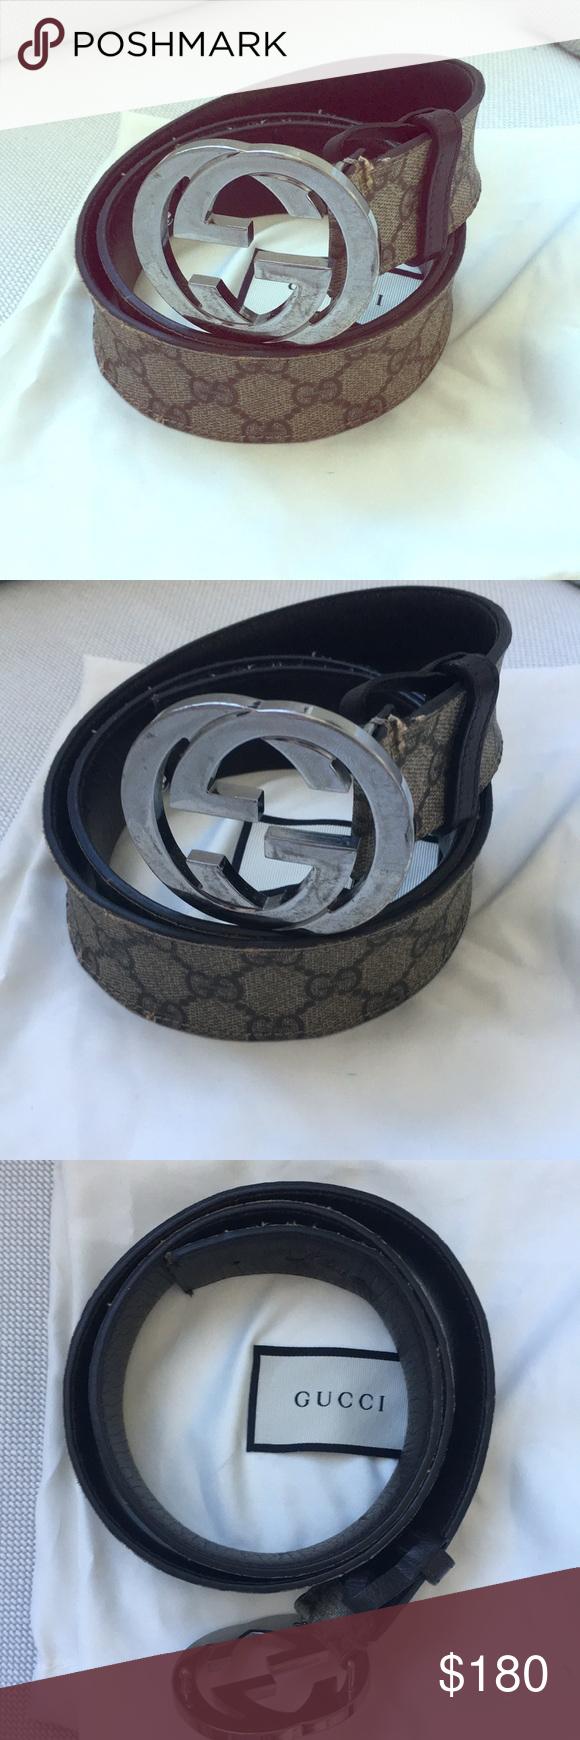 b3152365557 Gucci belt 100% authentic Gucci belt